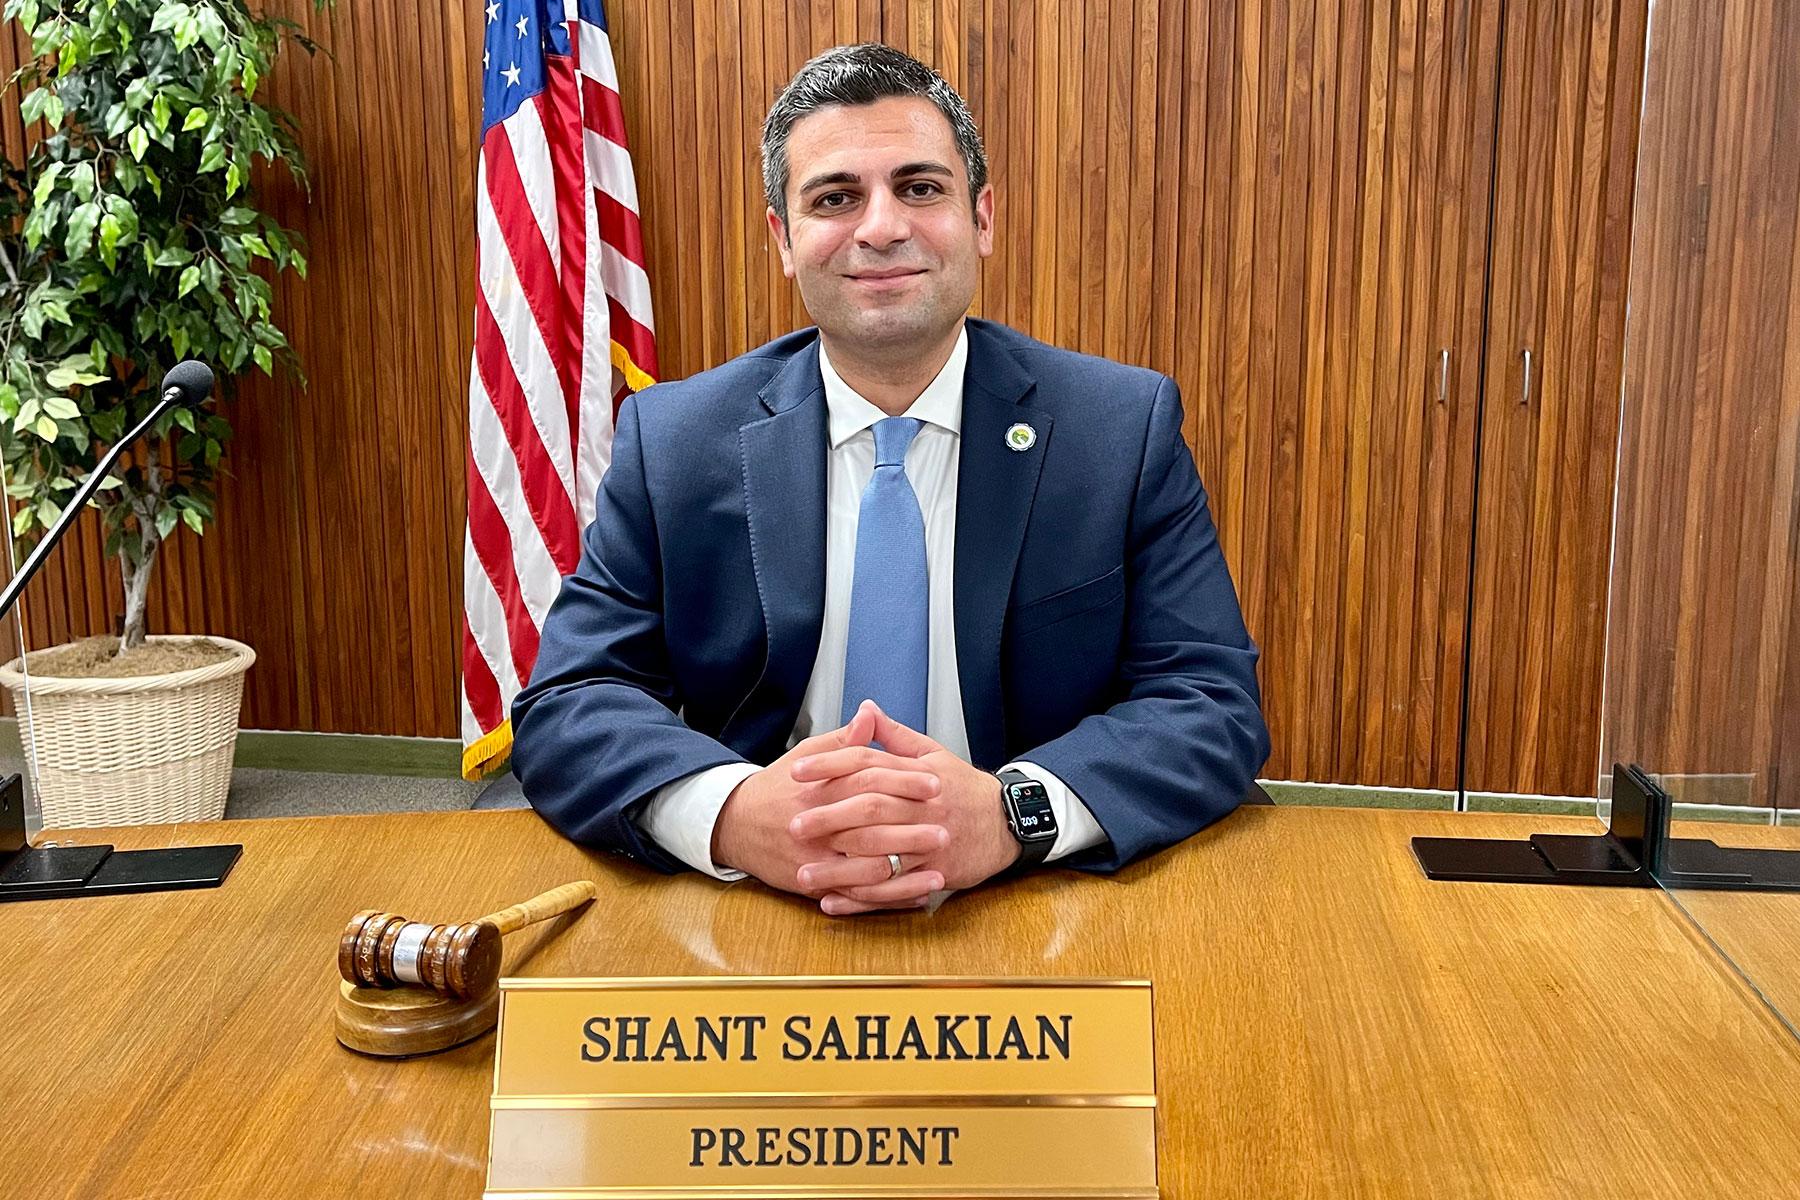 GUSD School Board President Shant Sahakian